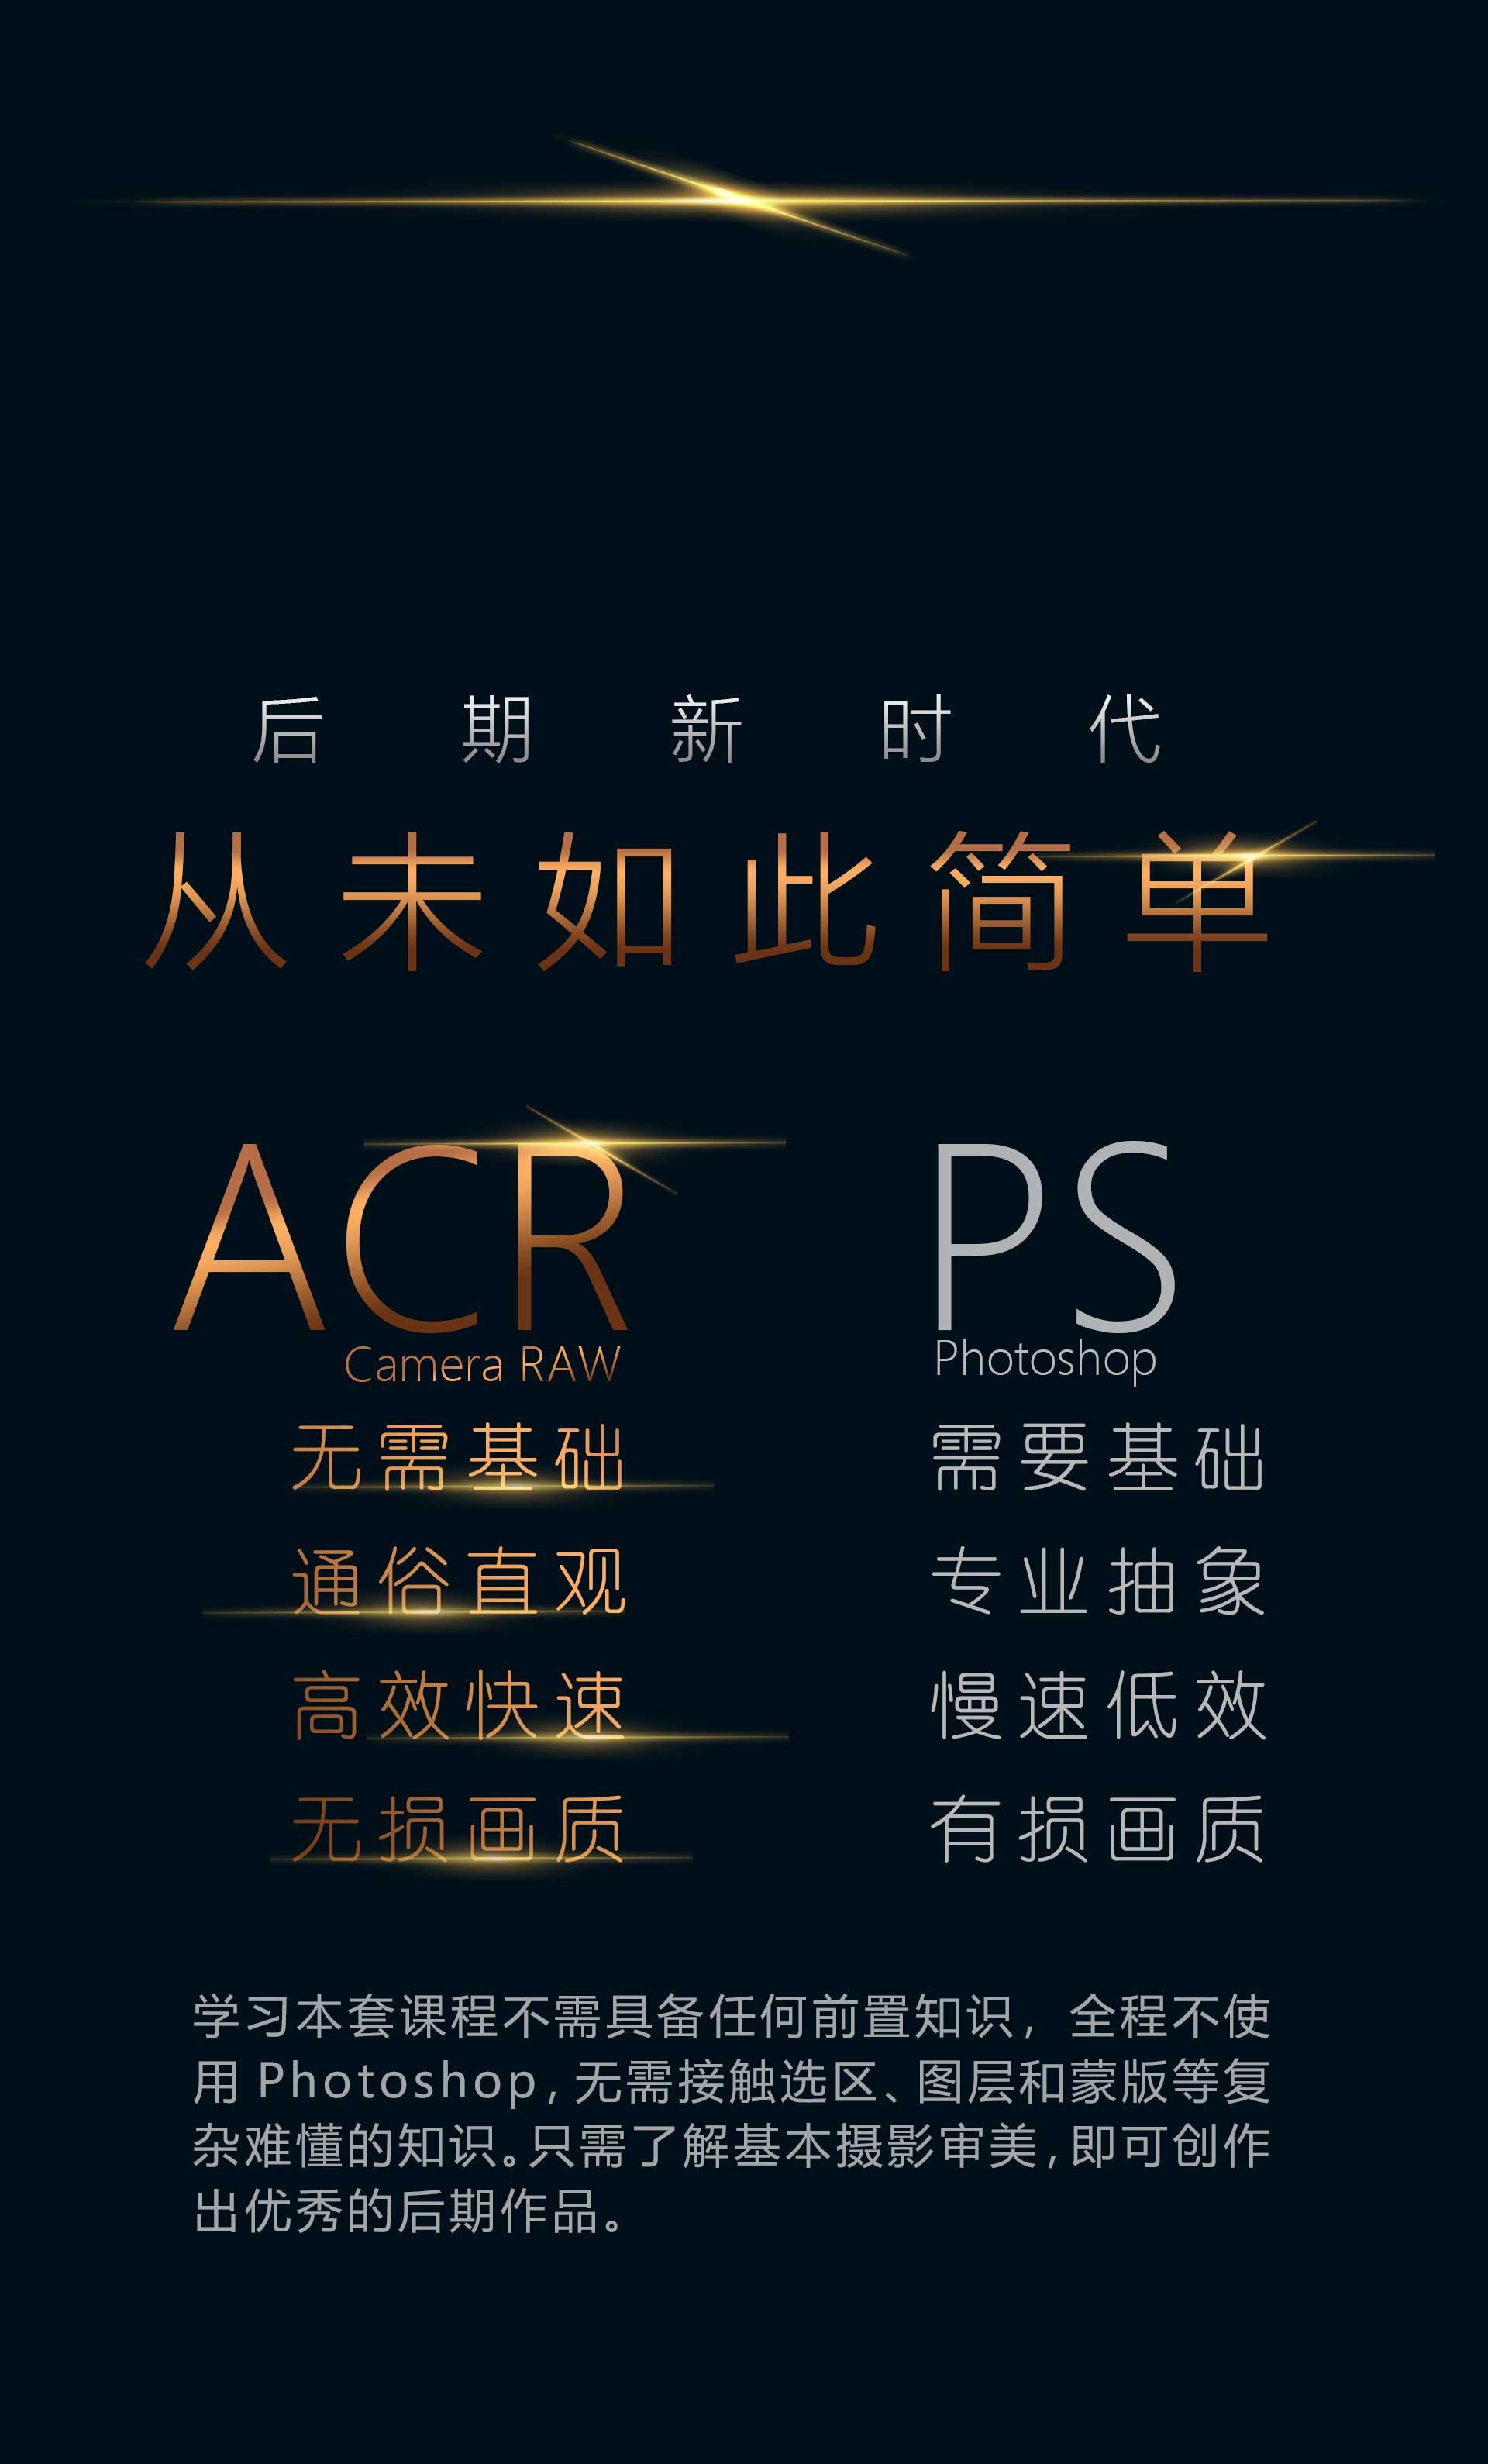 acr2020_detils_mobile_03.jpg